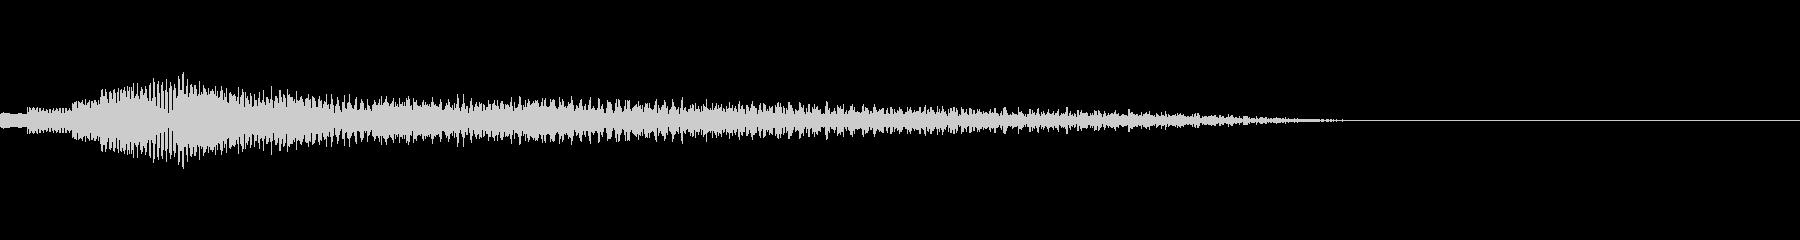 Vibraphone、Slow D...の未再生の波形